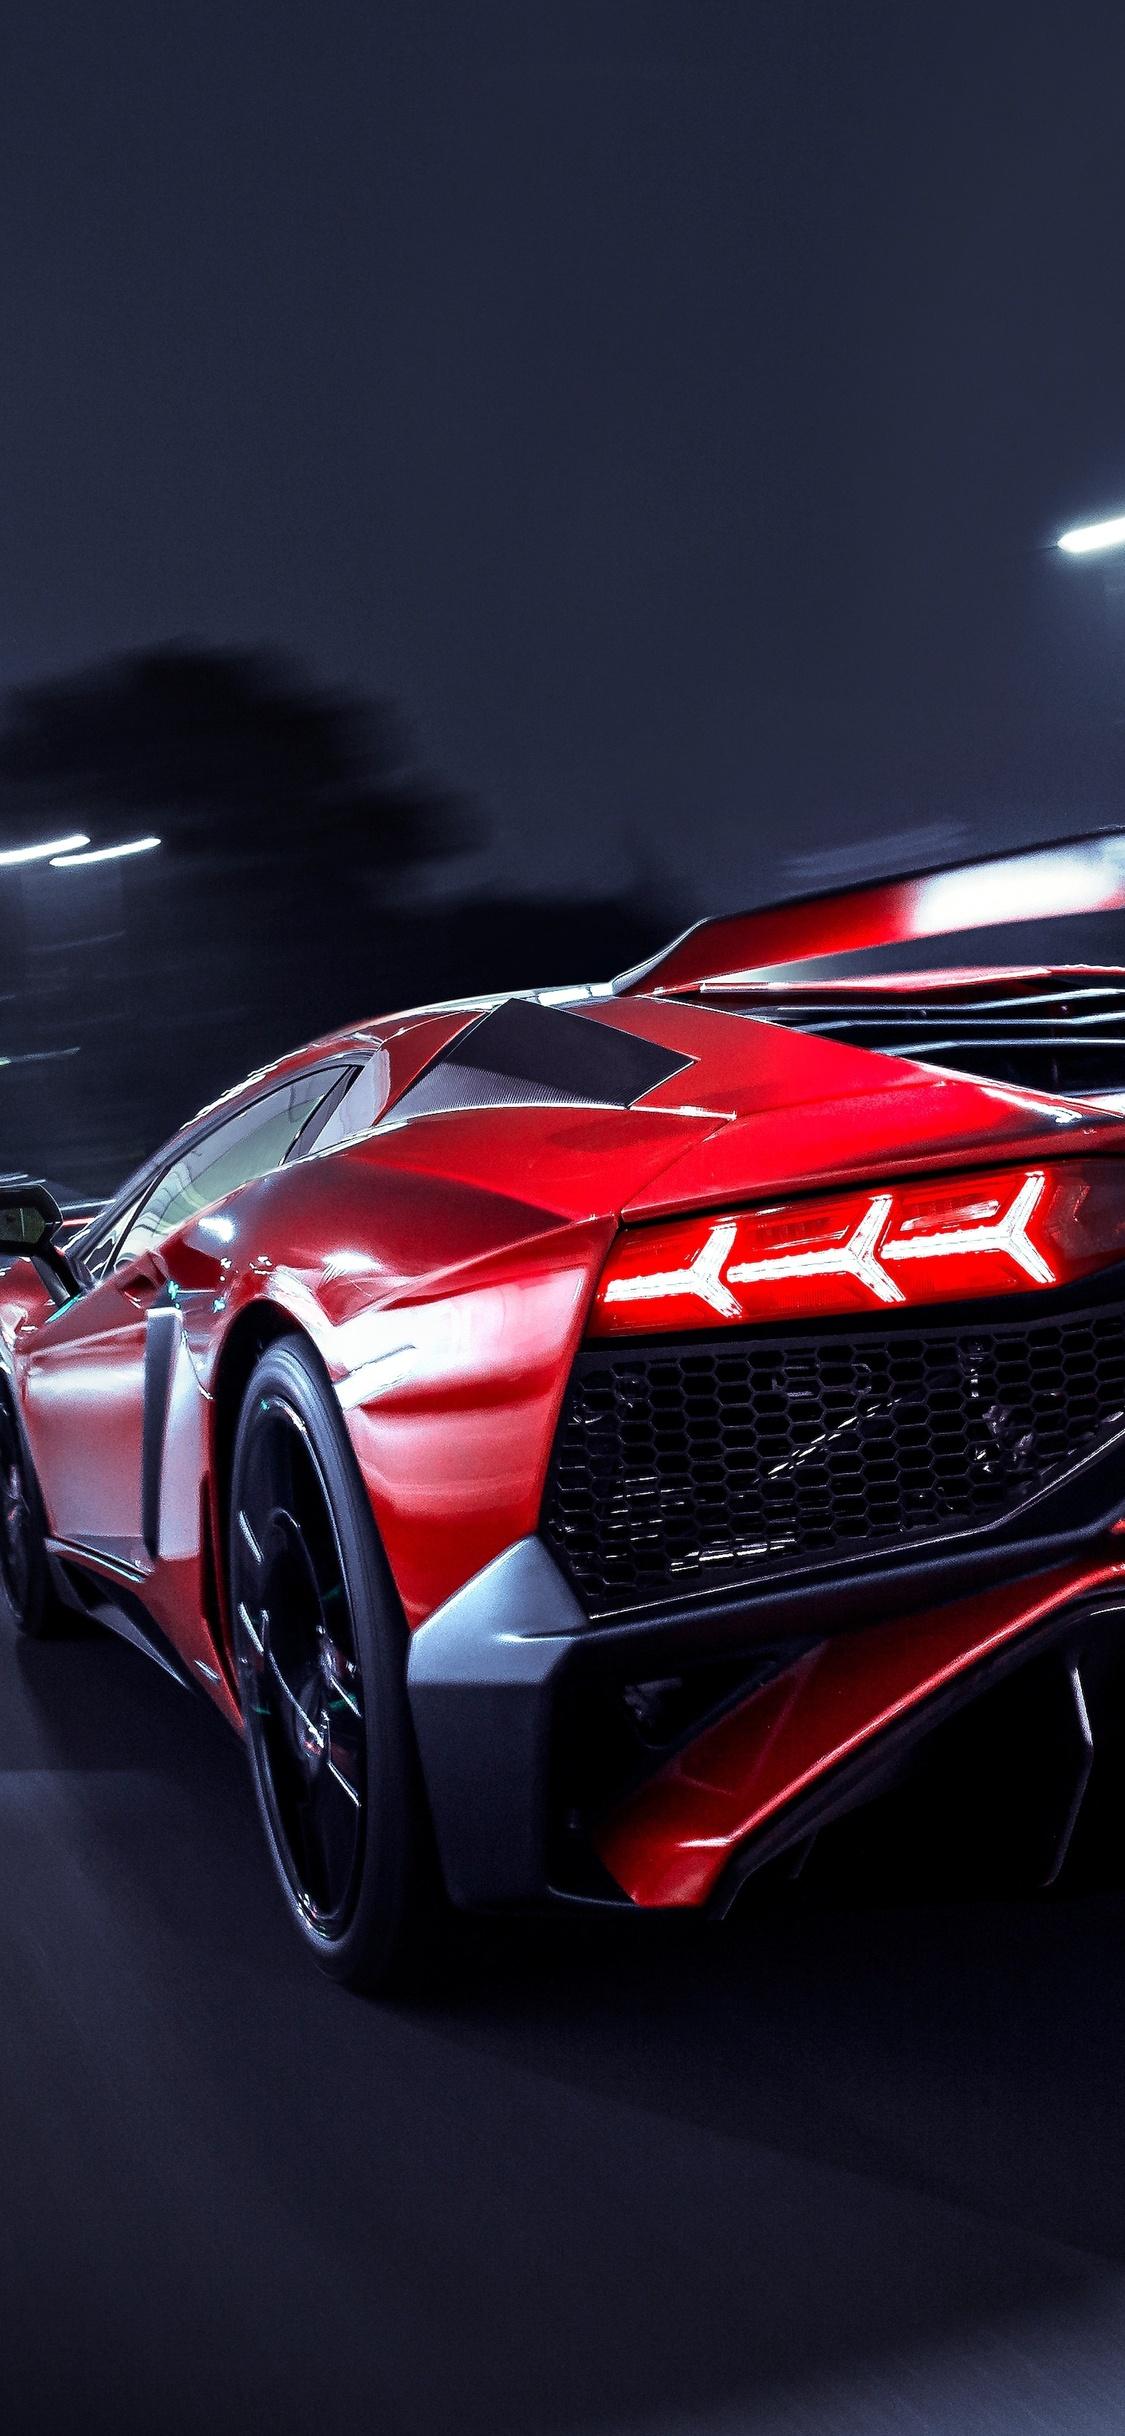 1125x2436 Lamborghini Aventador Sv Rear Lights Iphone Xs